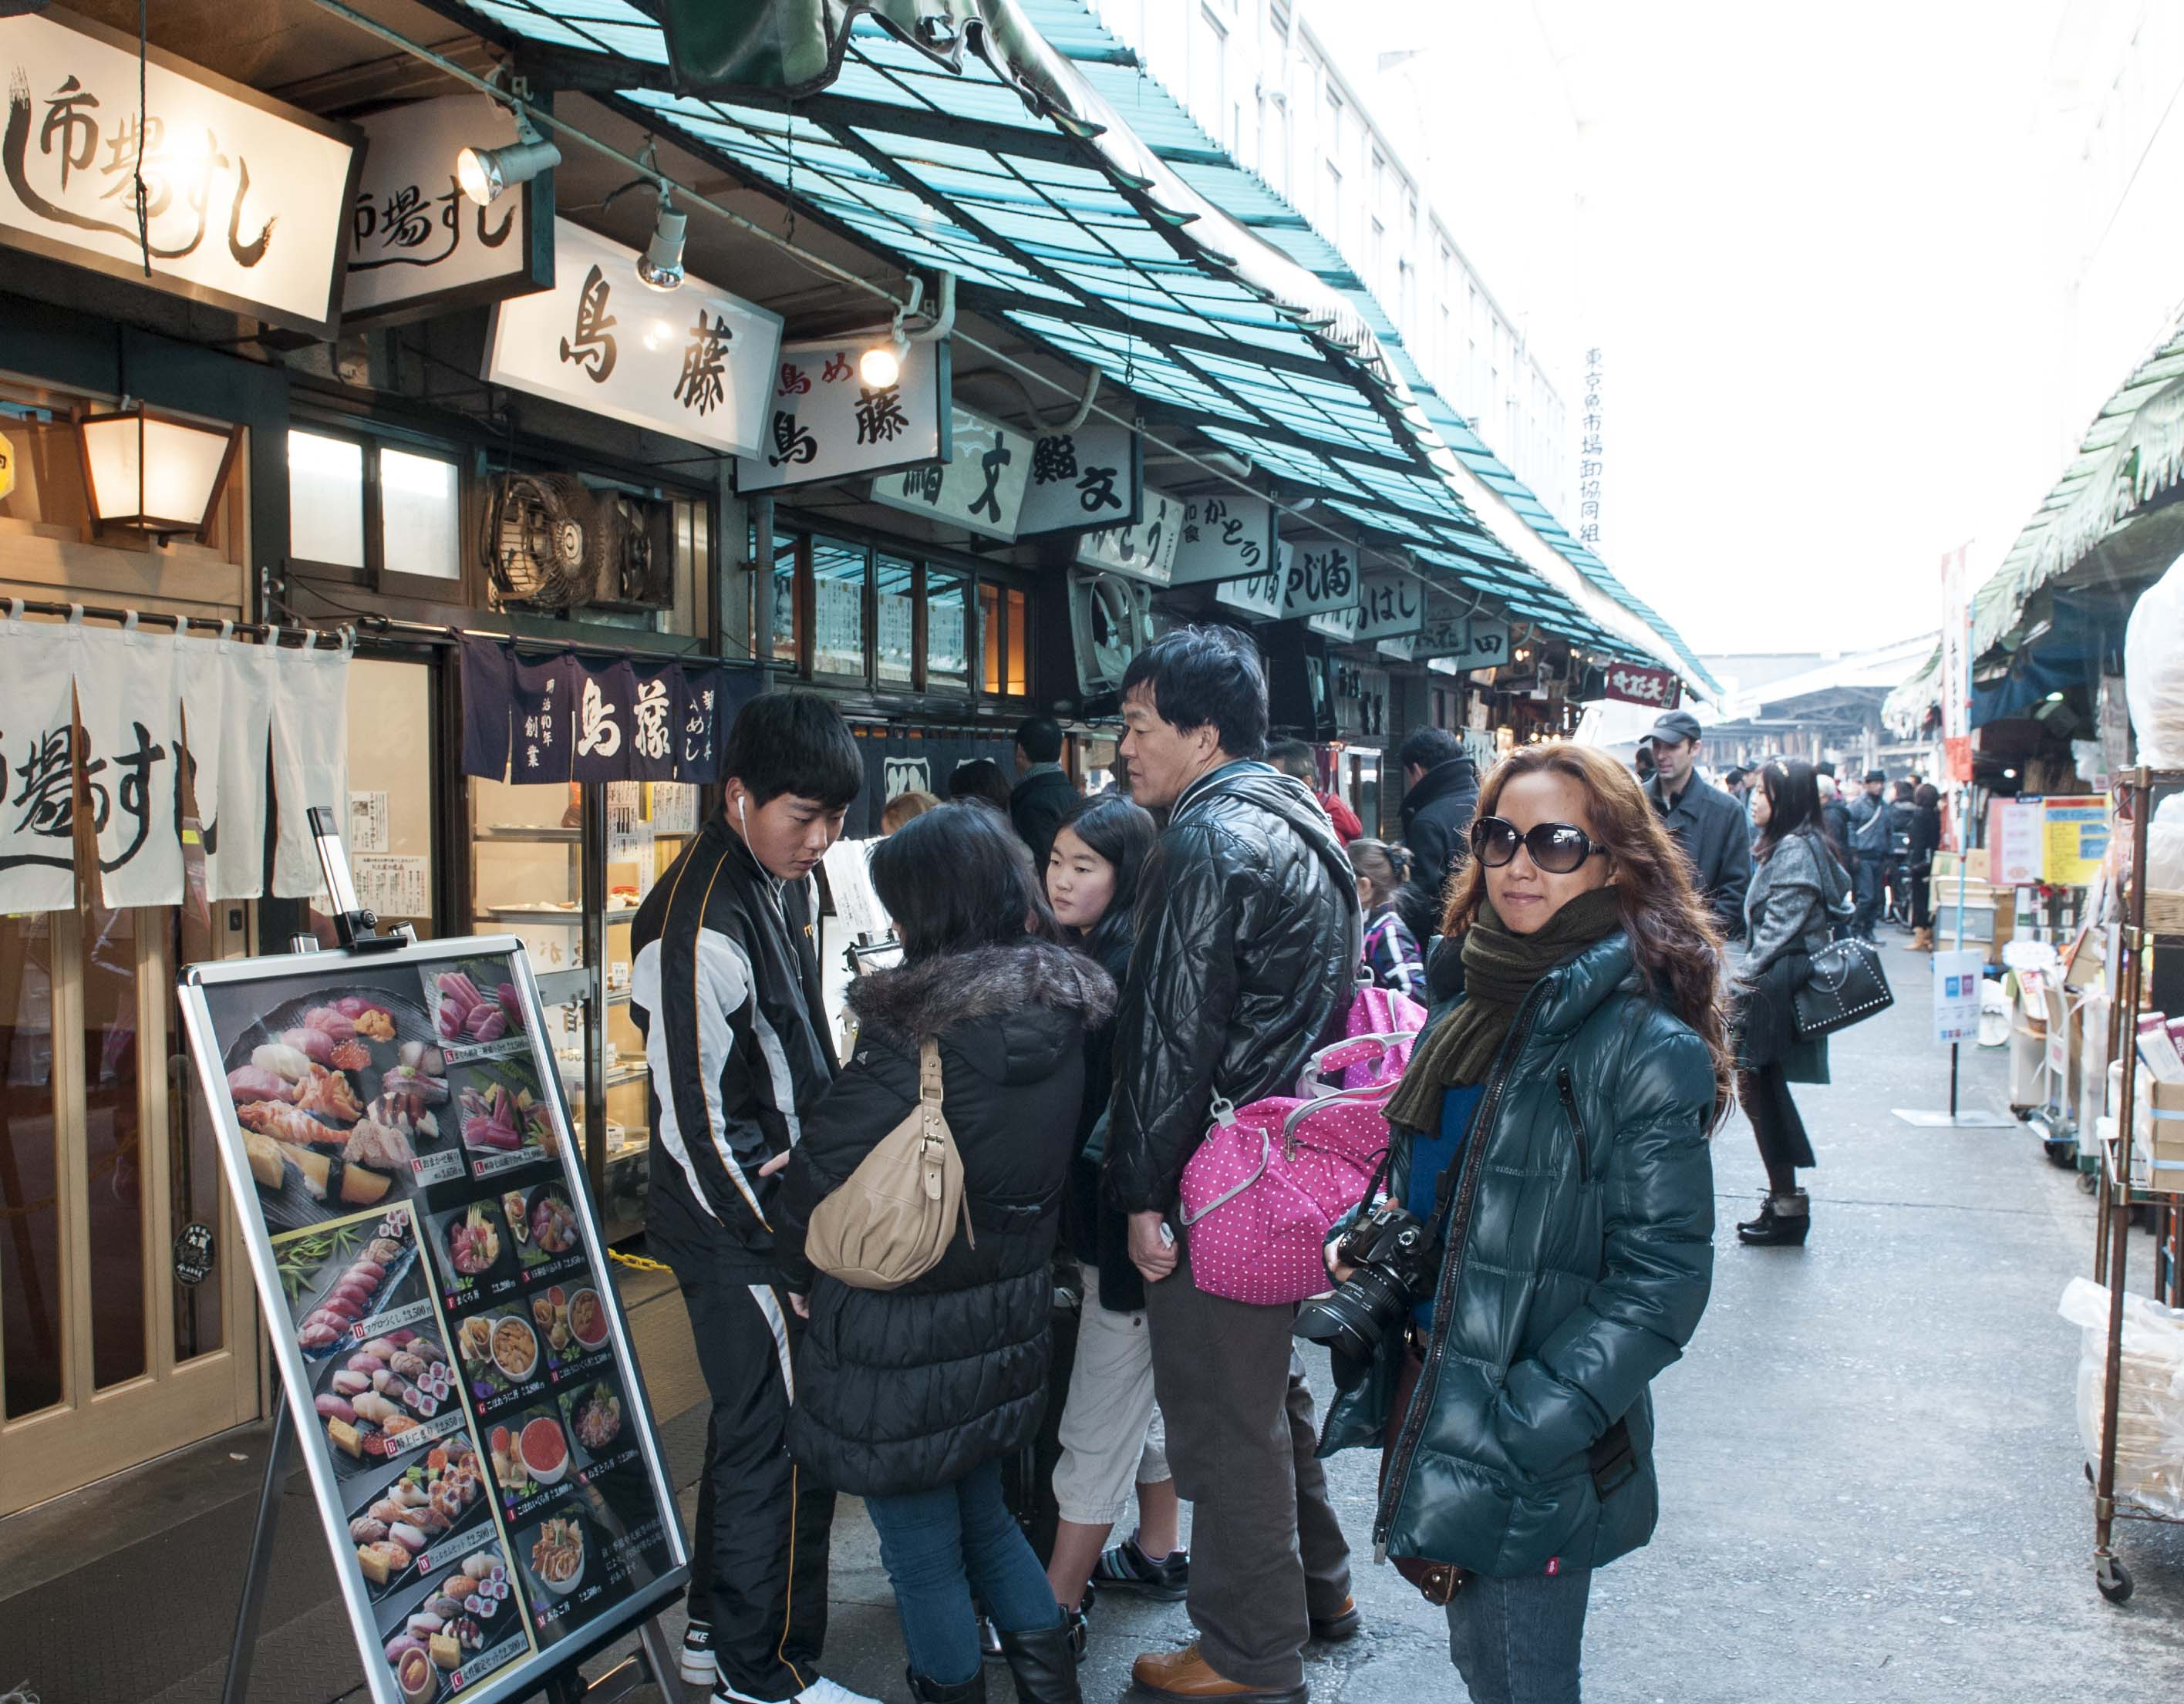 Fresh sushi restaurant nearby the fish market.